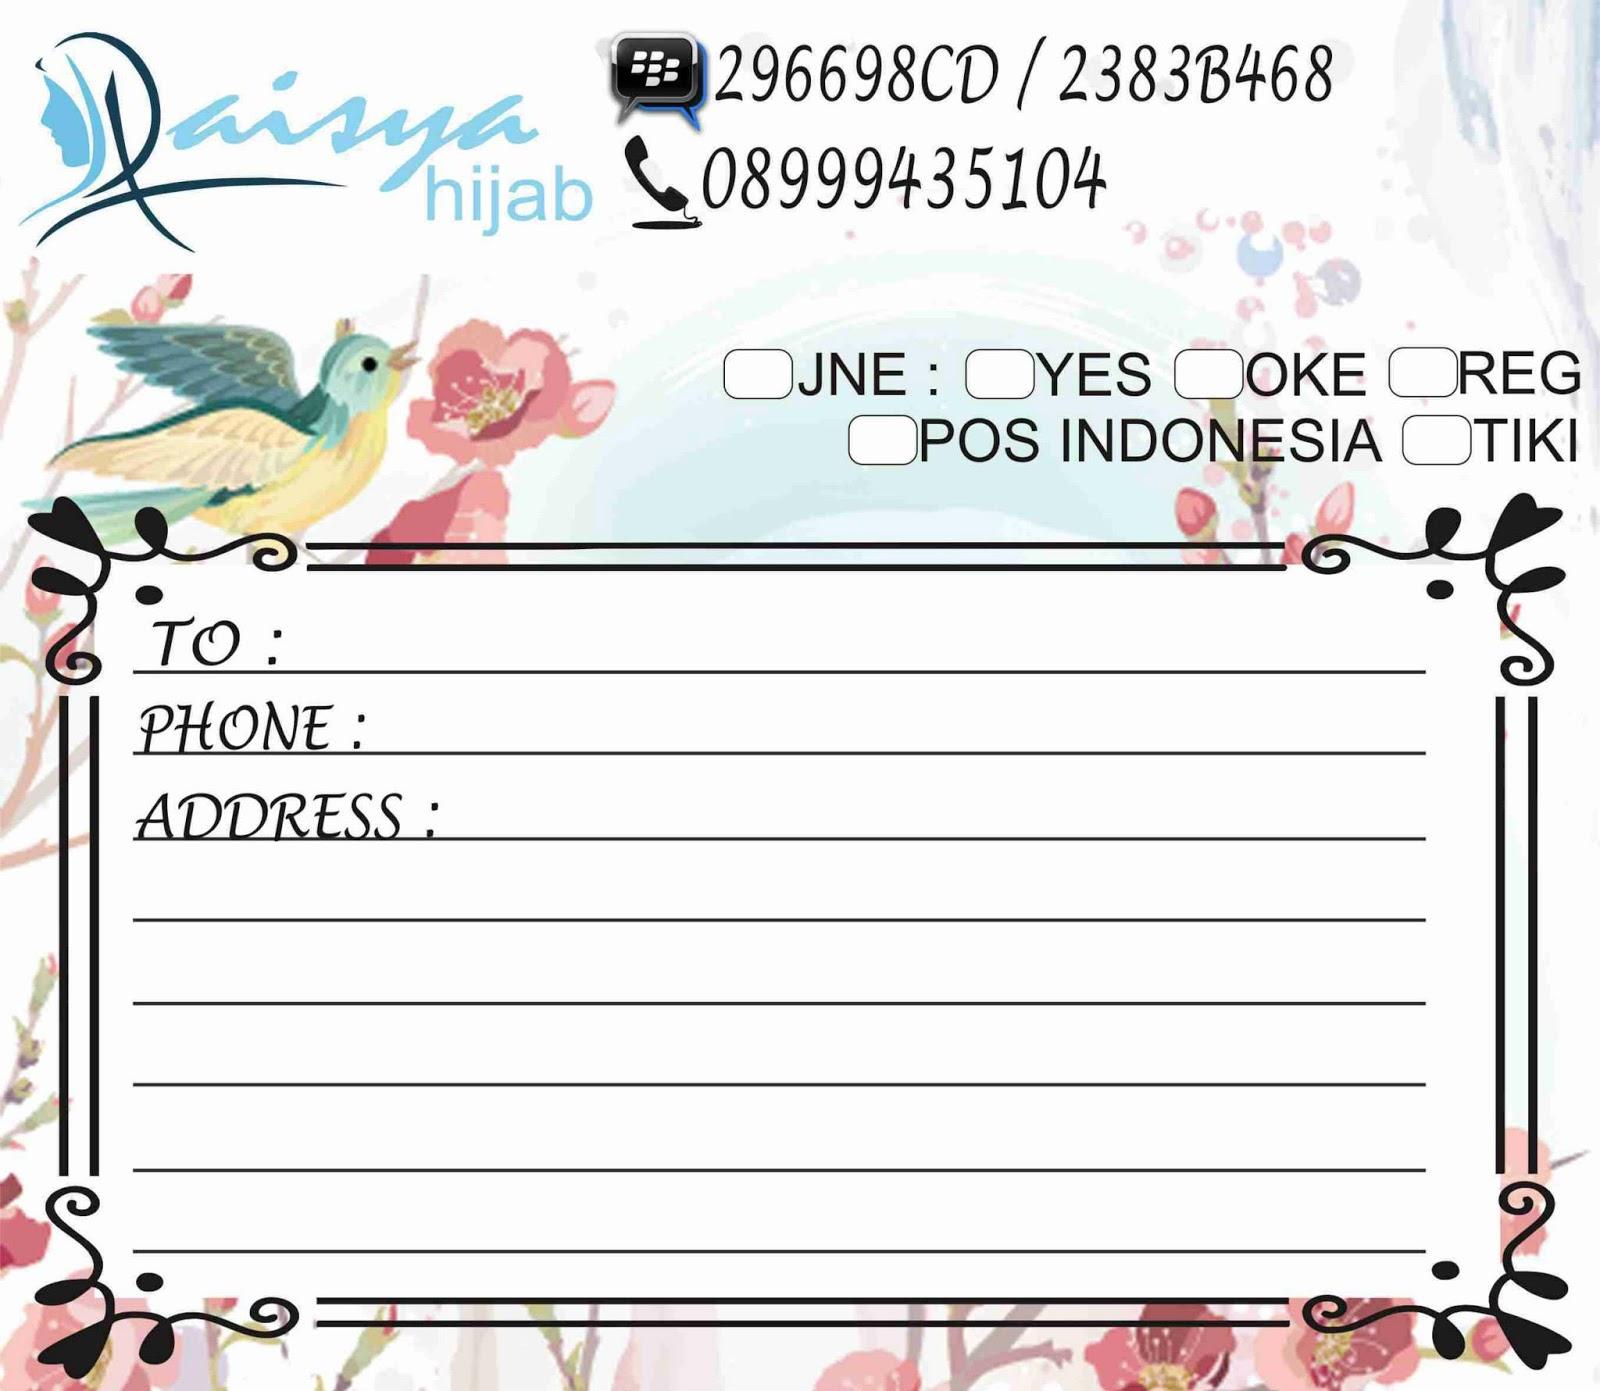 Design Kreatif Kota Malang: Contoh Desain Sticker